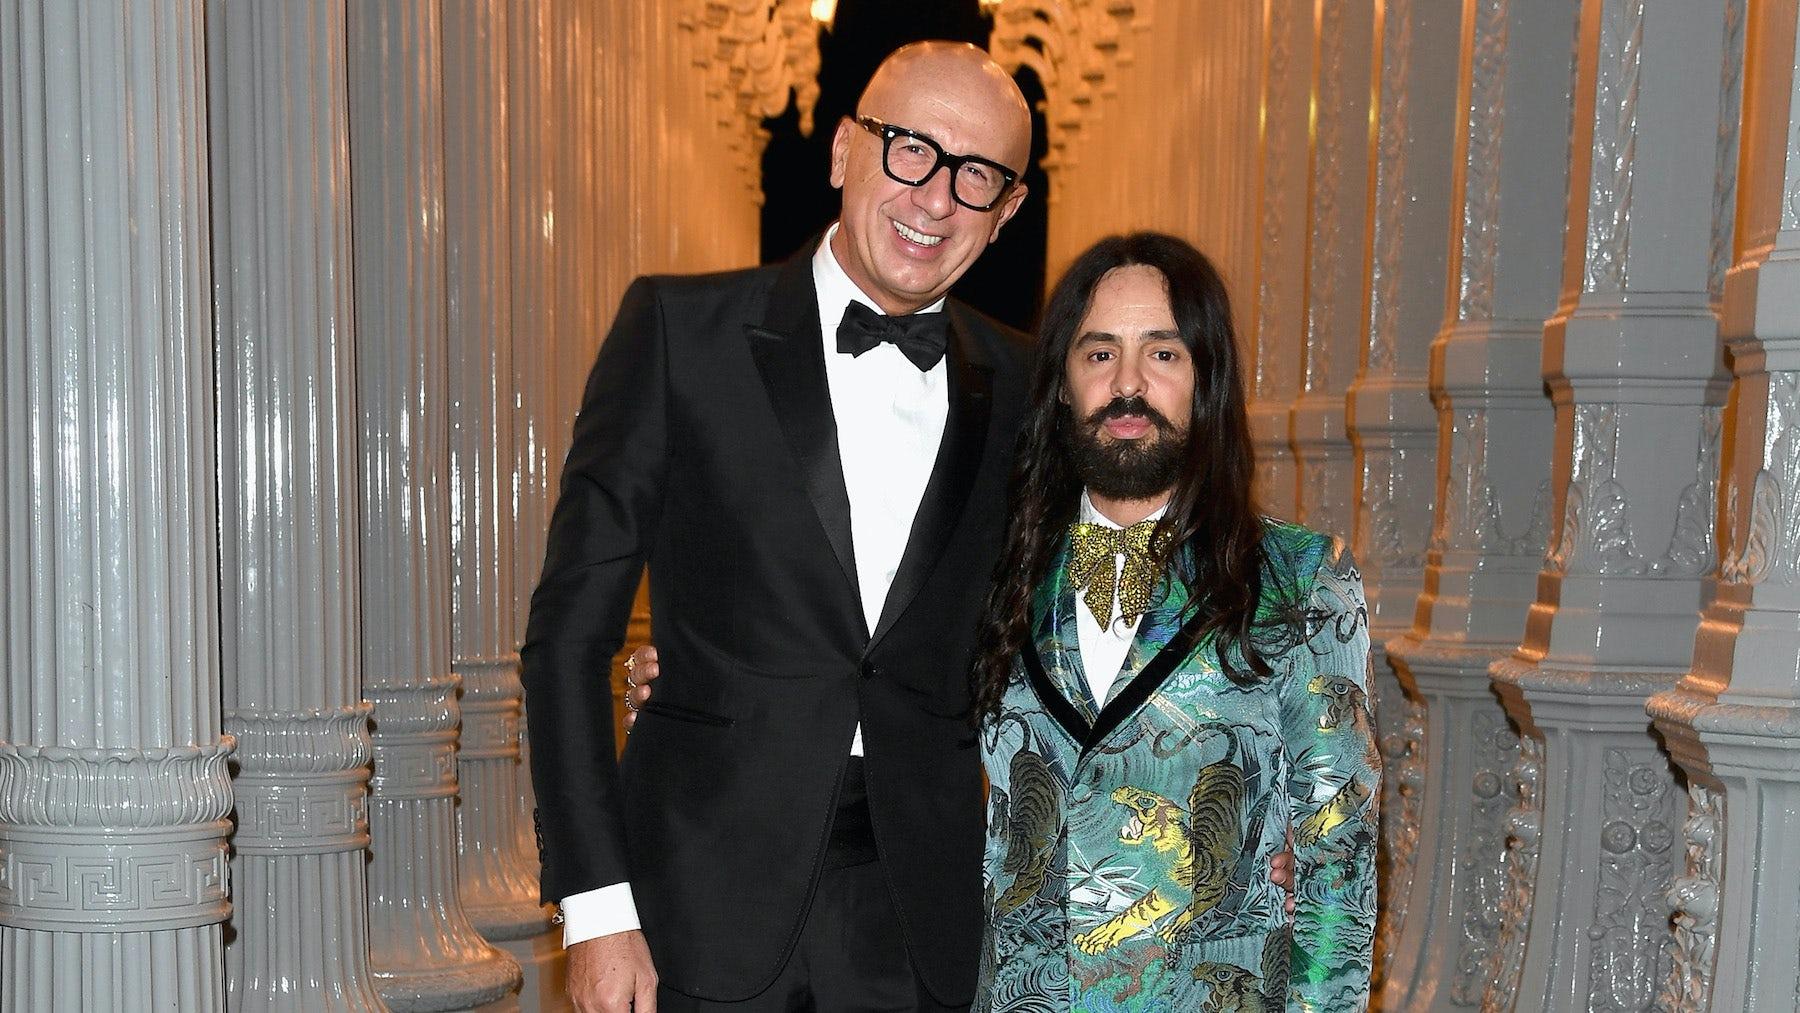 Gucci chief executive Marco Bizzarri with Gucci creative director Alessandro Michele at the LACMA Art + Film Gala 2016 | Source: Getty Images